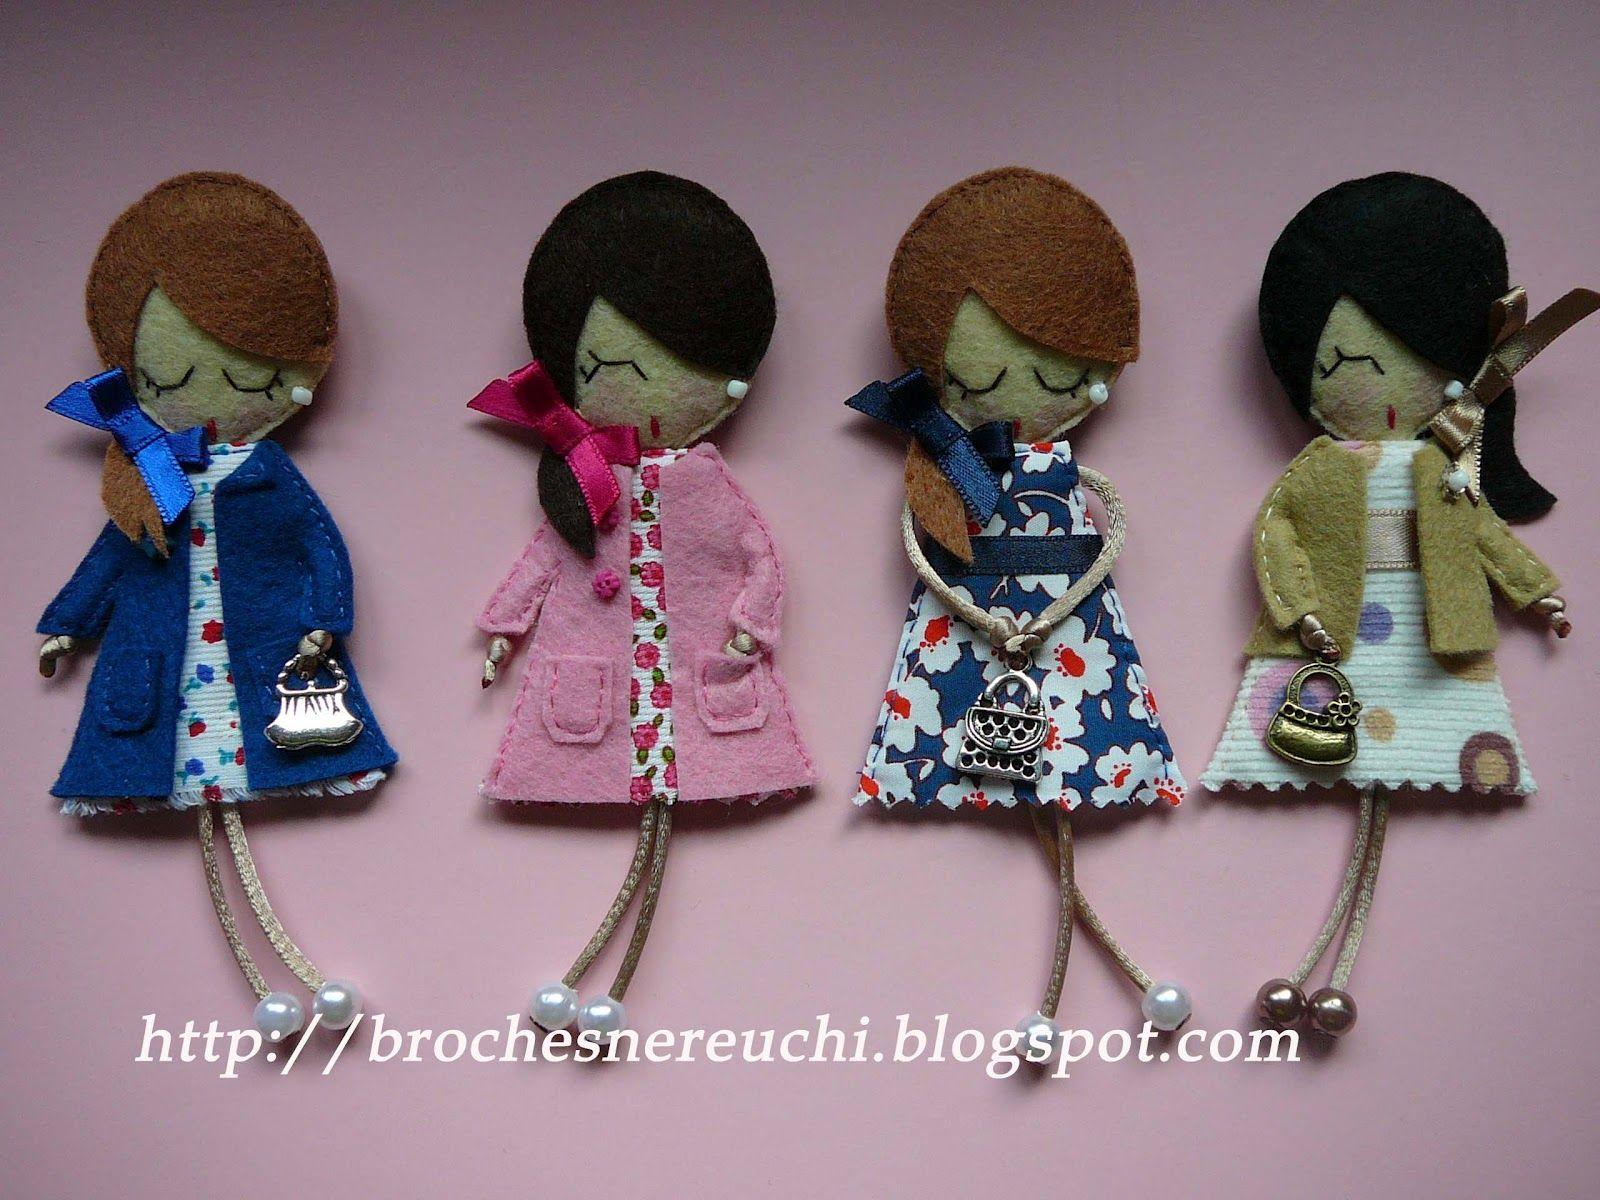 Broches nereuchi caritas felt pinterest broches - Broches para manualidades ...